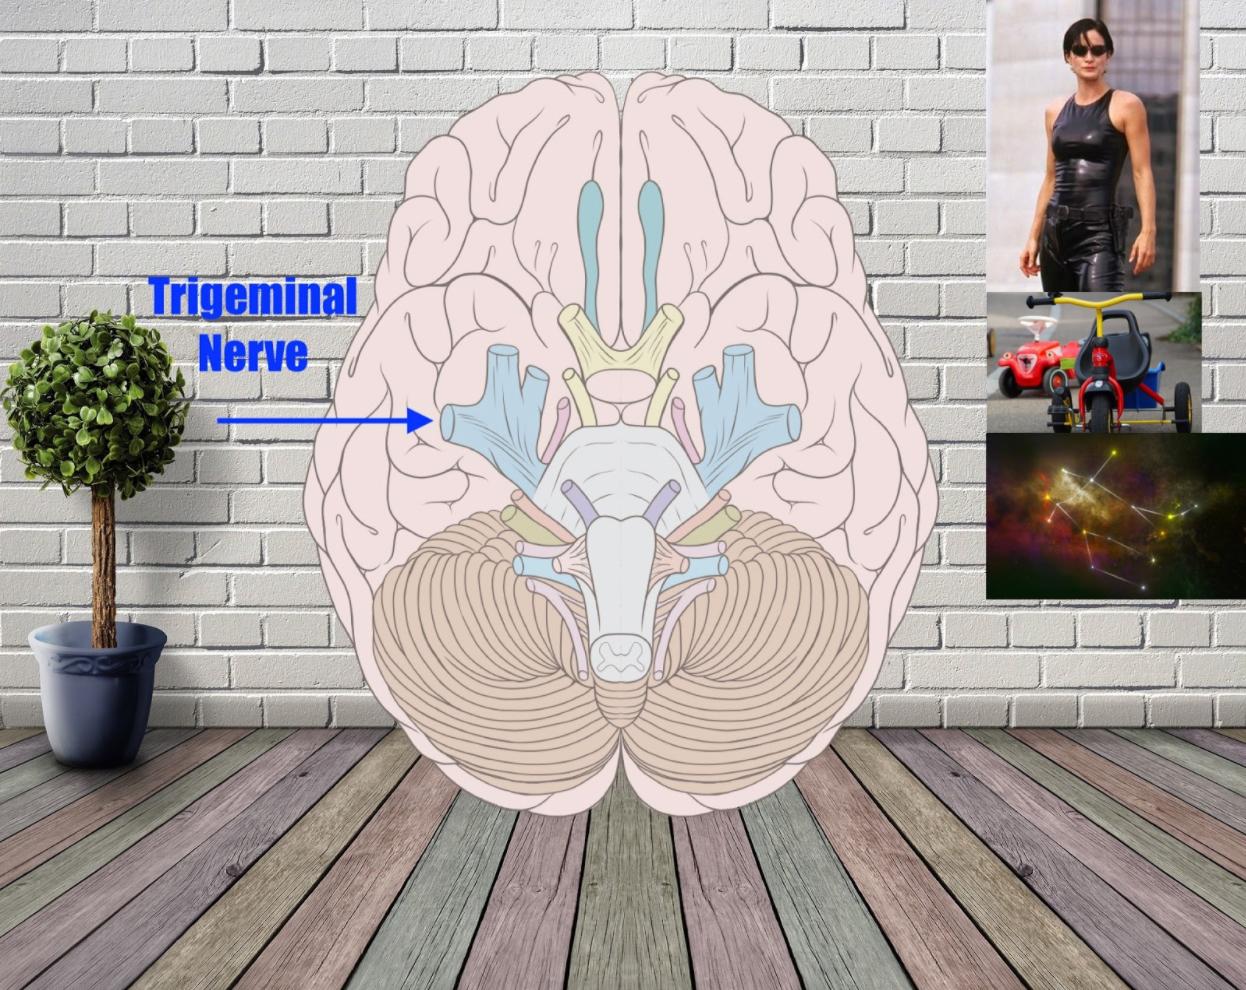 trigeminal nerve mnemonic example